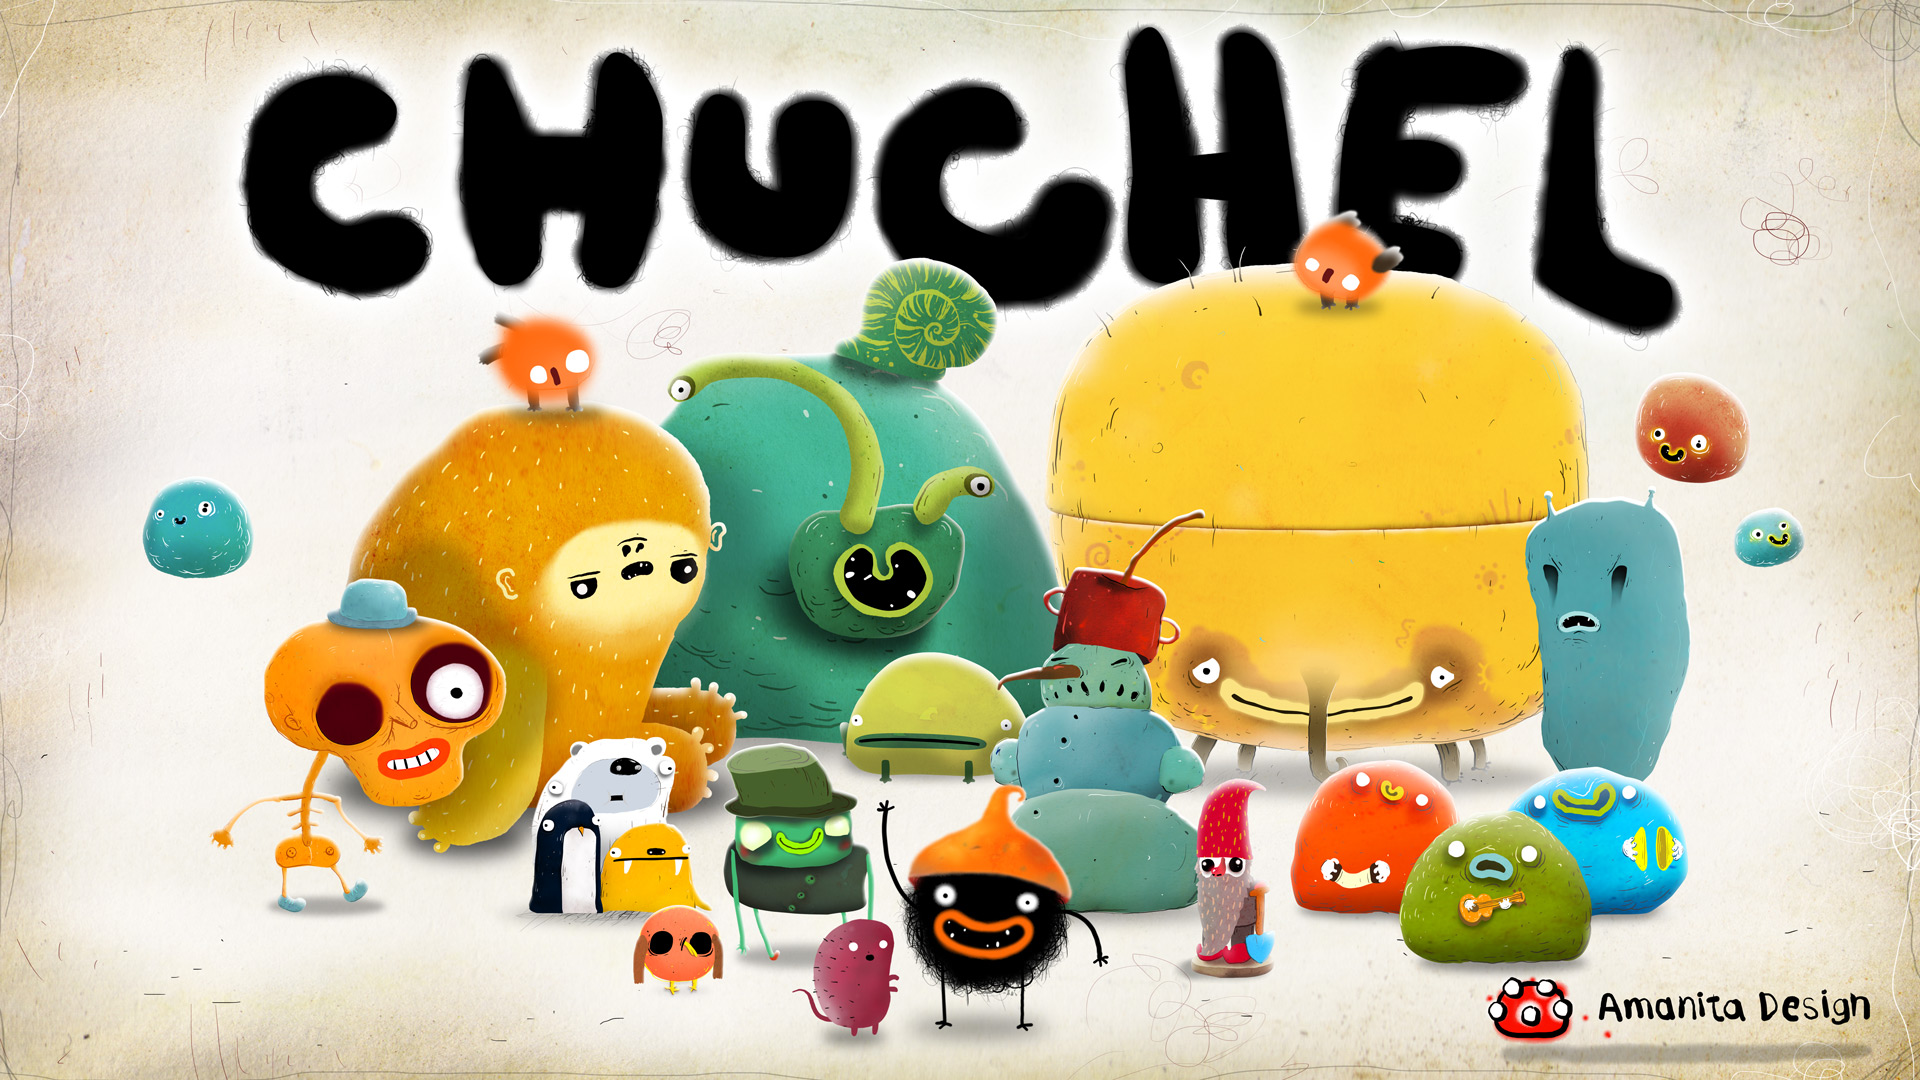 Chuchel game